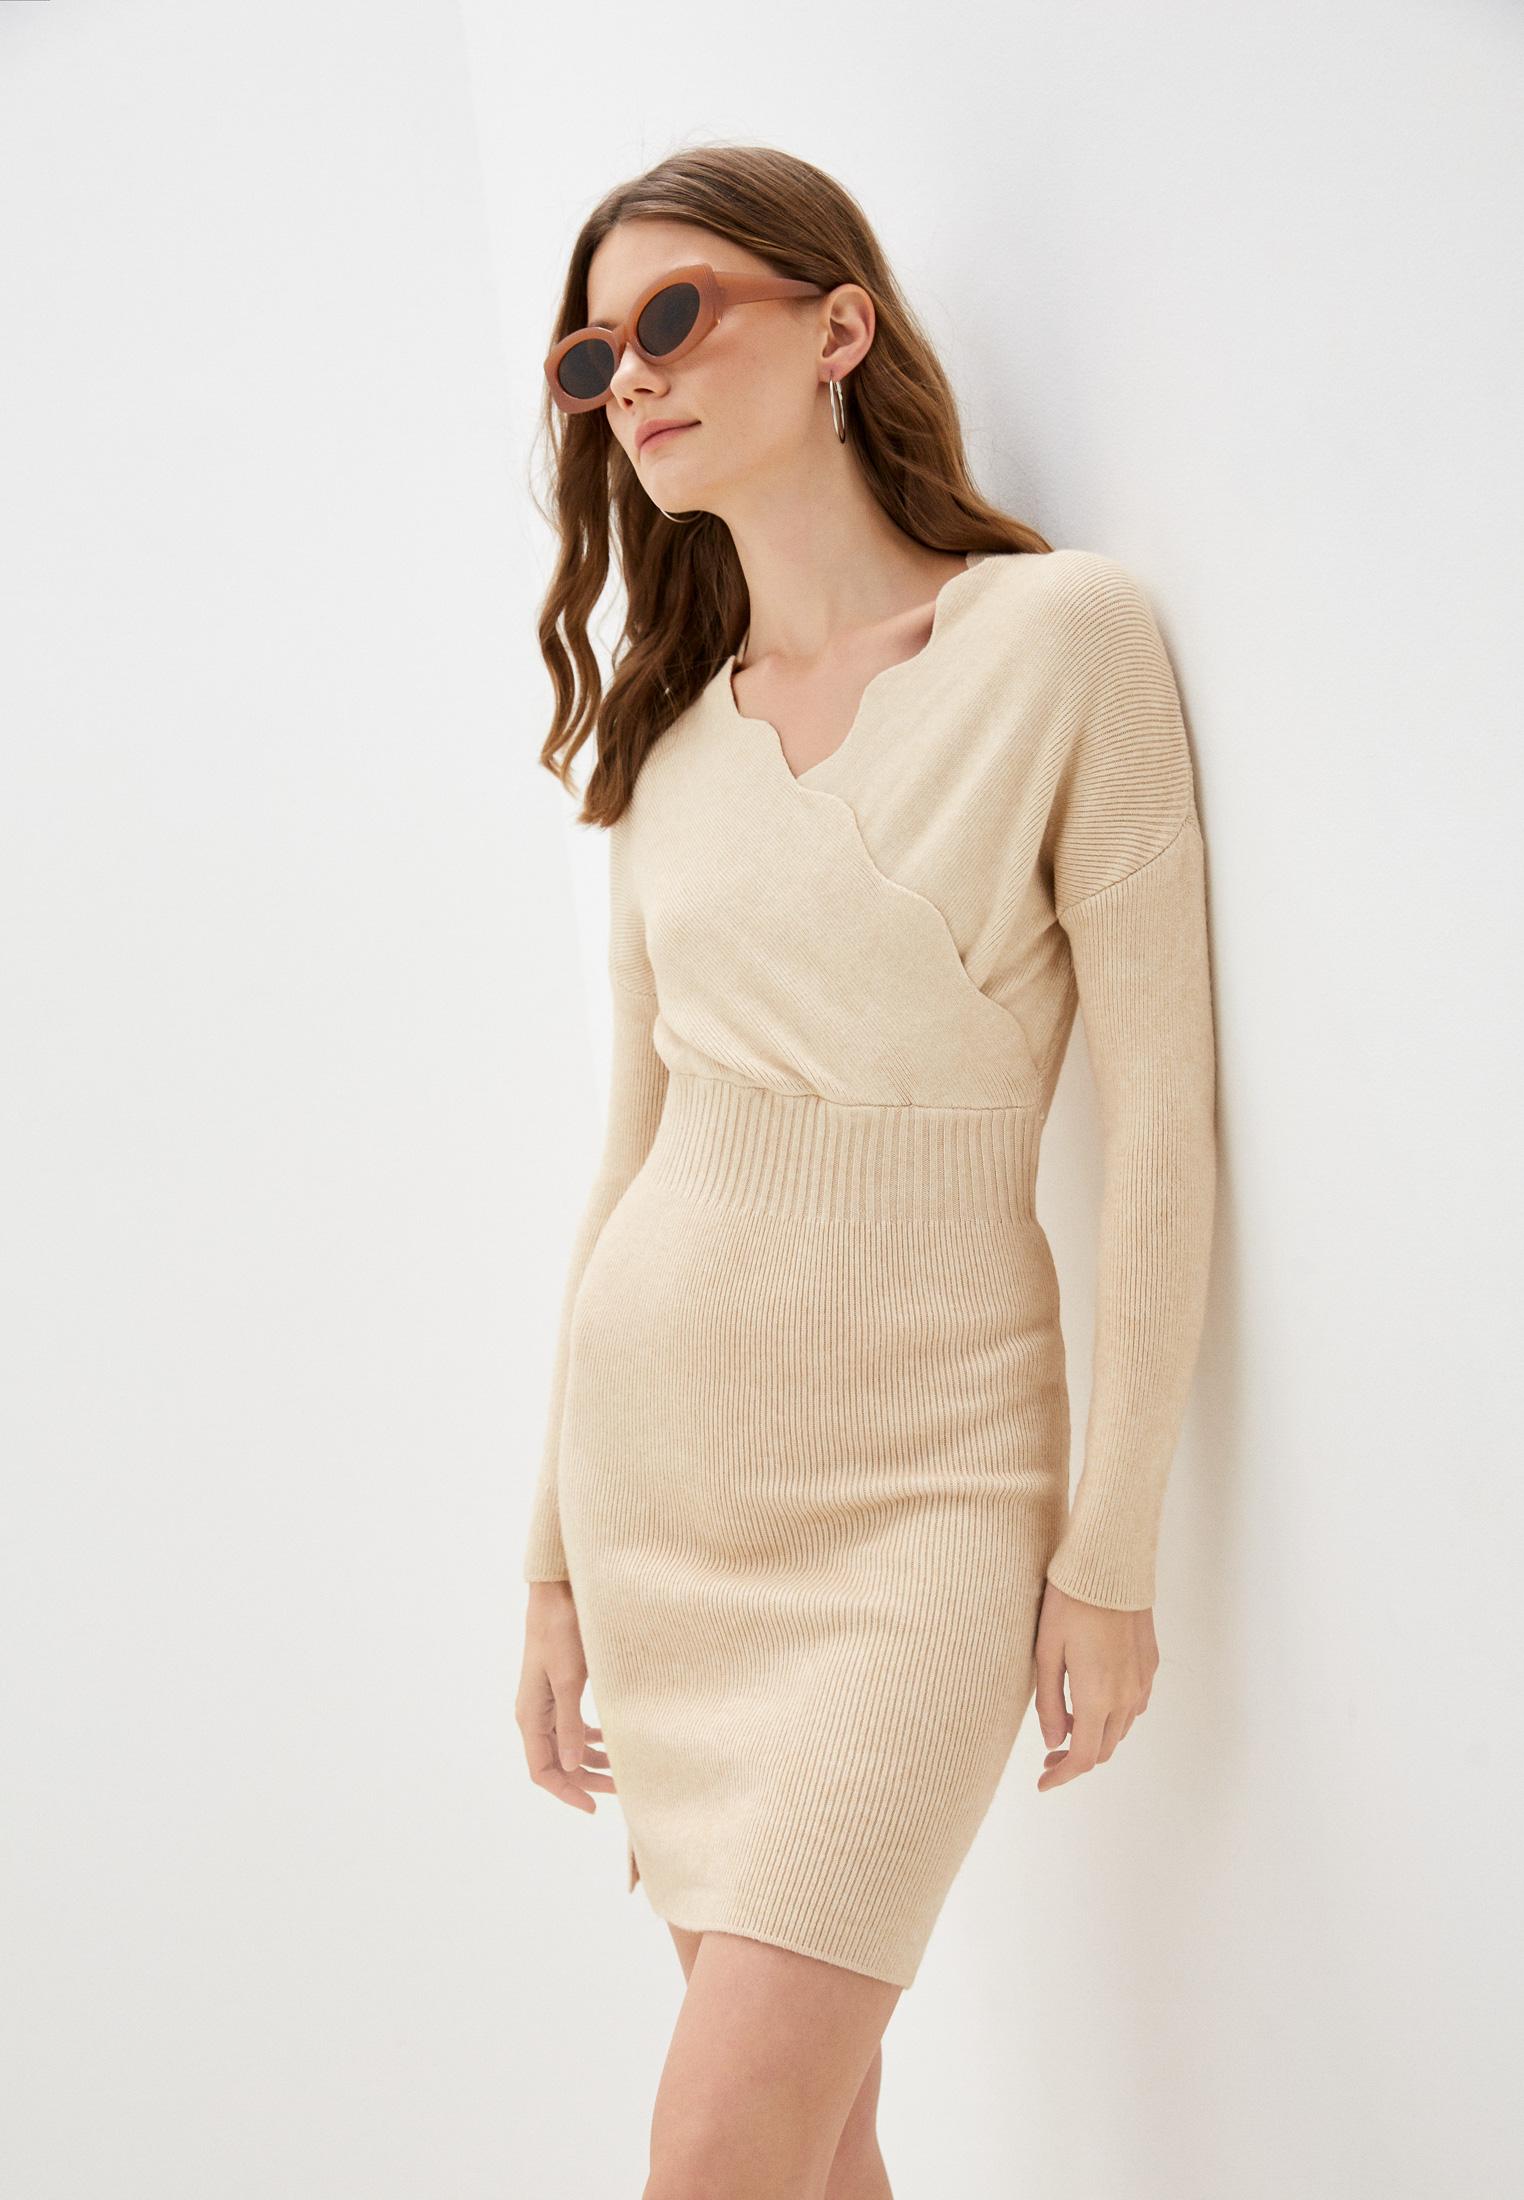 Вязаное платье Vickwool VW274-2